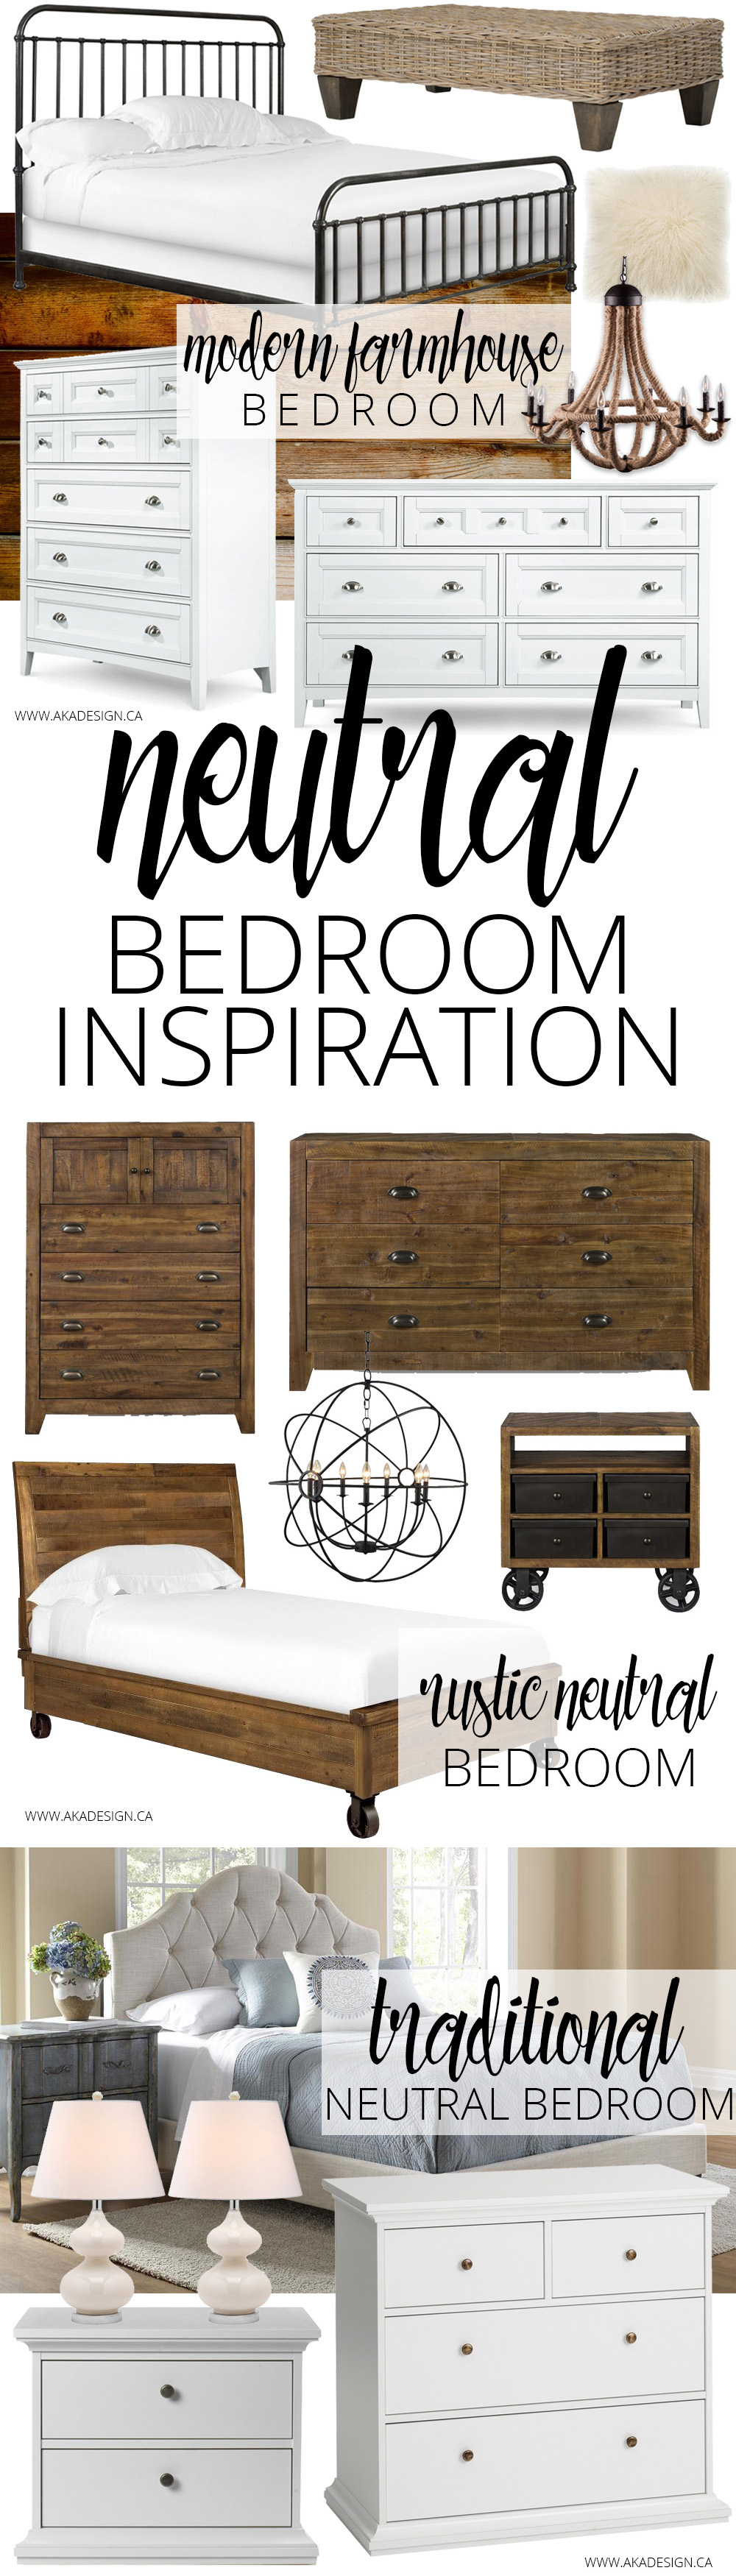 Neutral Bedroom Inspiration long